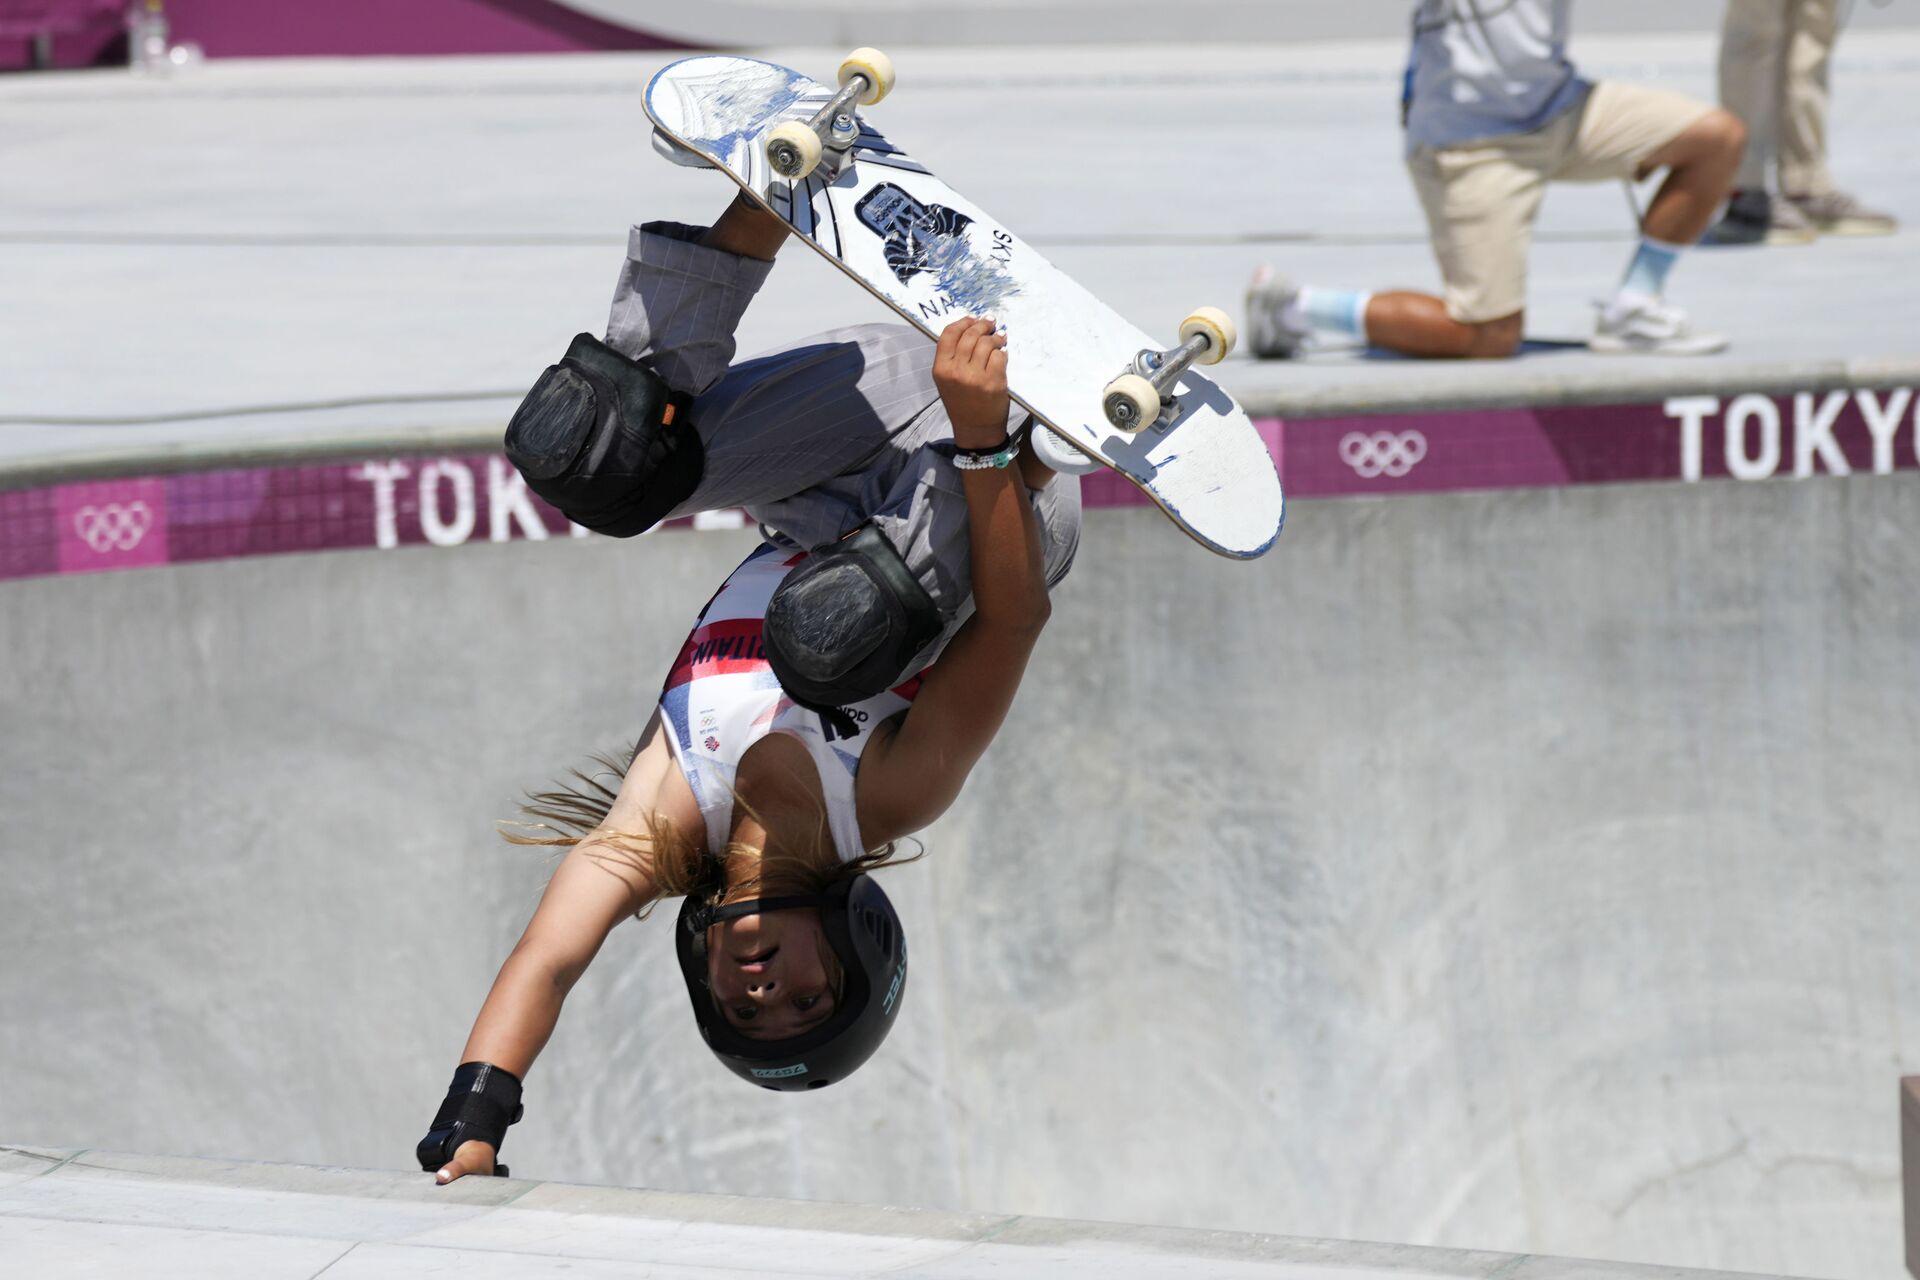 Sky Brown, 13, who won a bronze medal at the Tokyo Olympics - Sputnik International, 1920, 07.09.2021